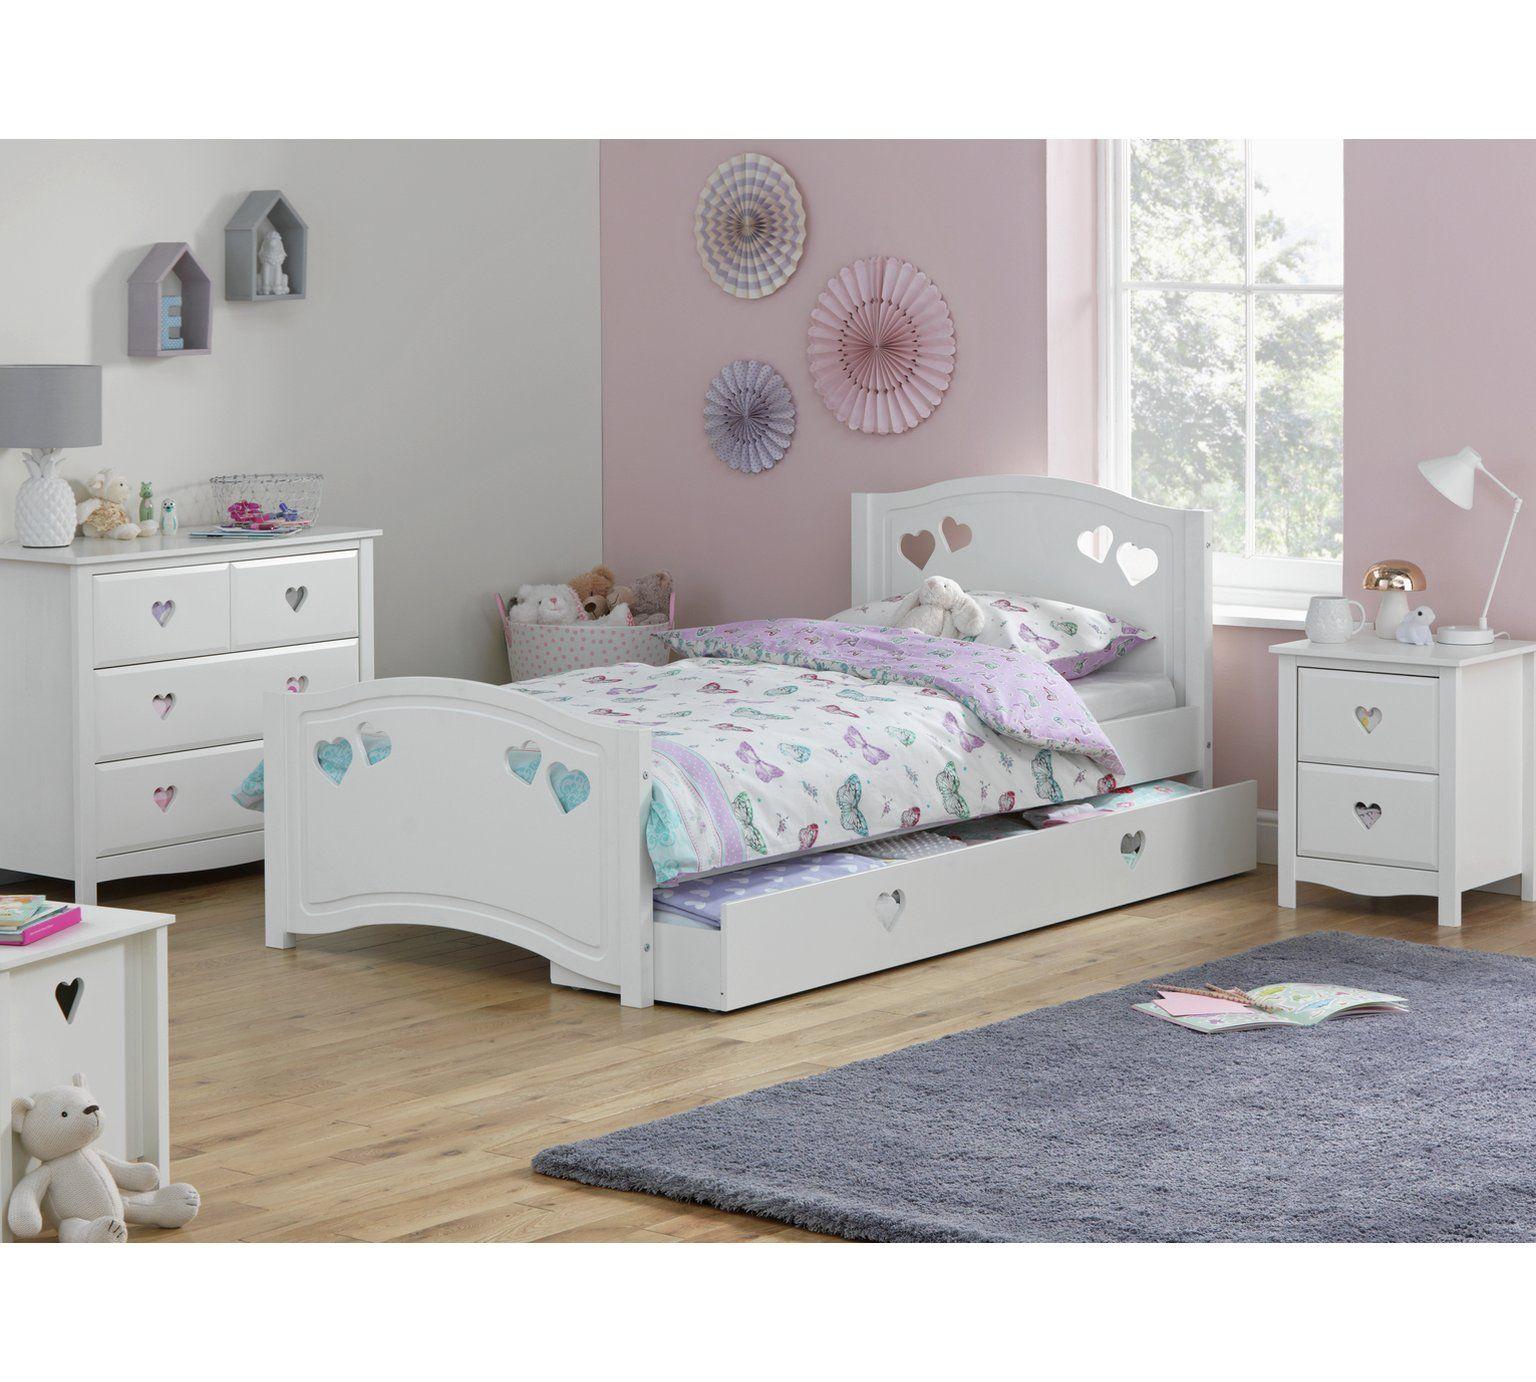 Buy Argos Home Mia Single Bed Frame White Kids Beds Argos White Single Bed Frame White Kids Bed Single Bed Frame